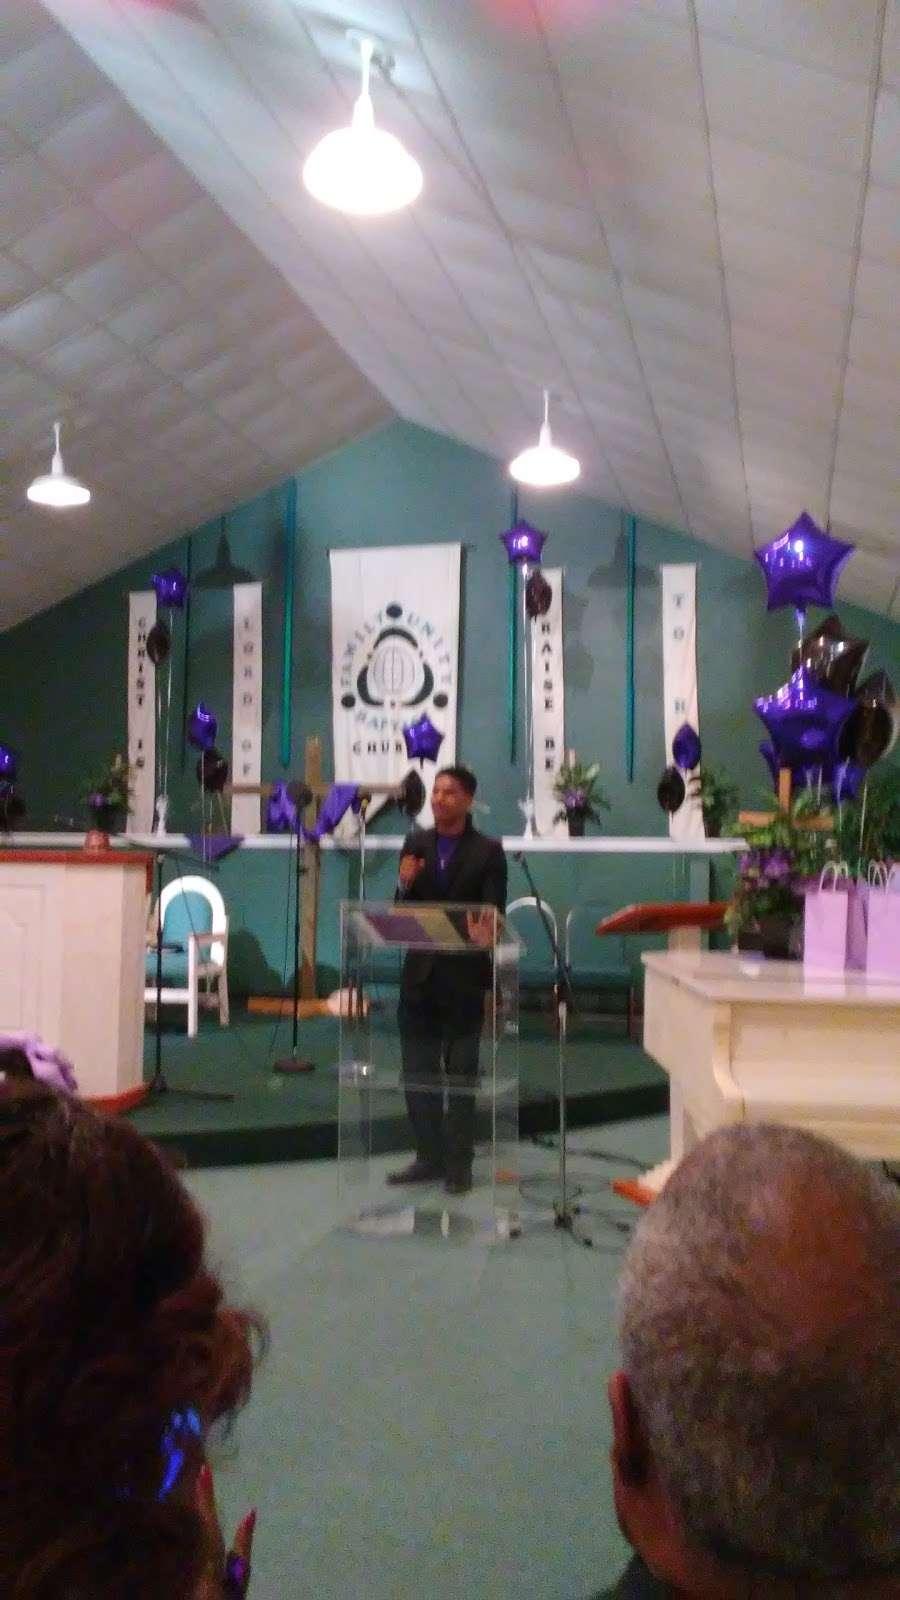 Family Unity Baptist Church - church    Photo 1 of 5   Address: 1221 Cedar Dr, La Marque, TX 77568, USA   Phone: (409) 933-4962